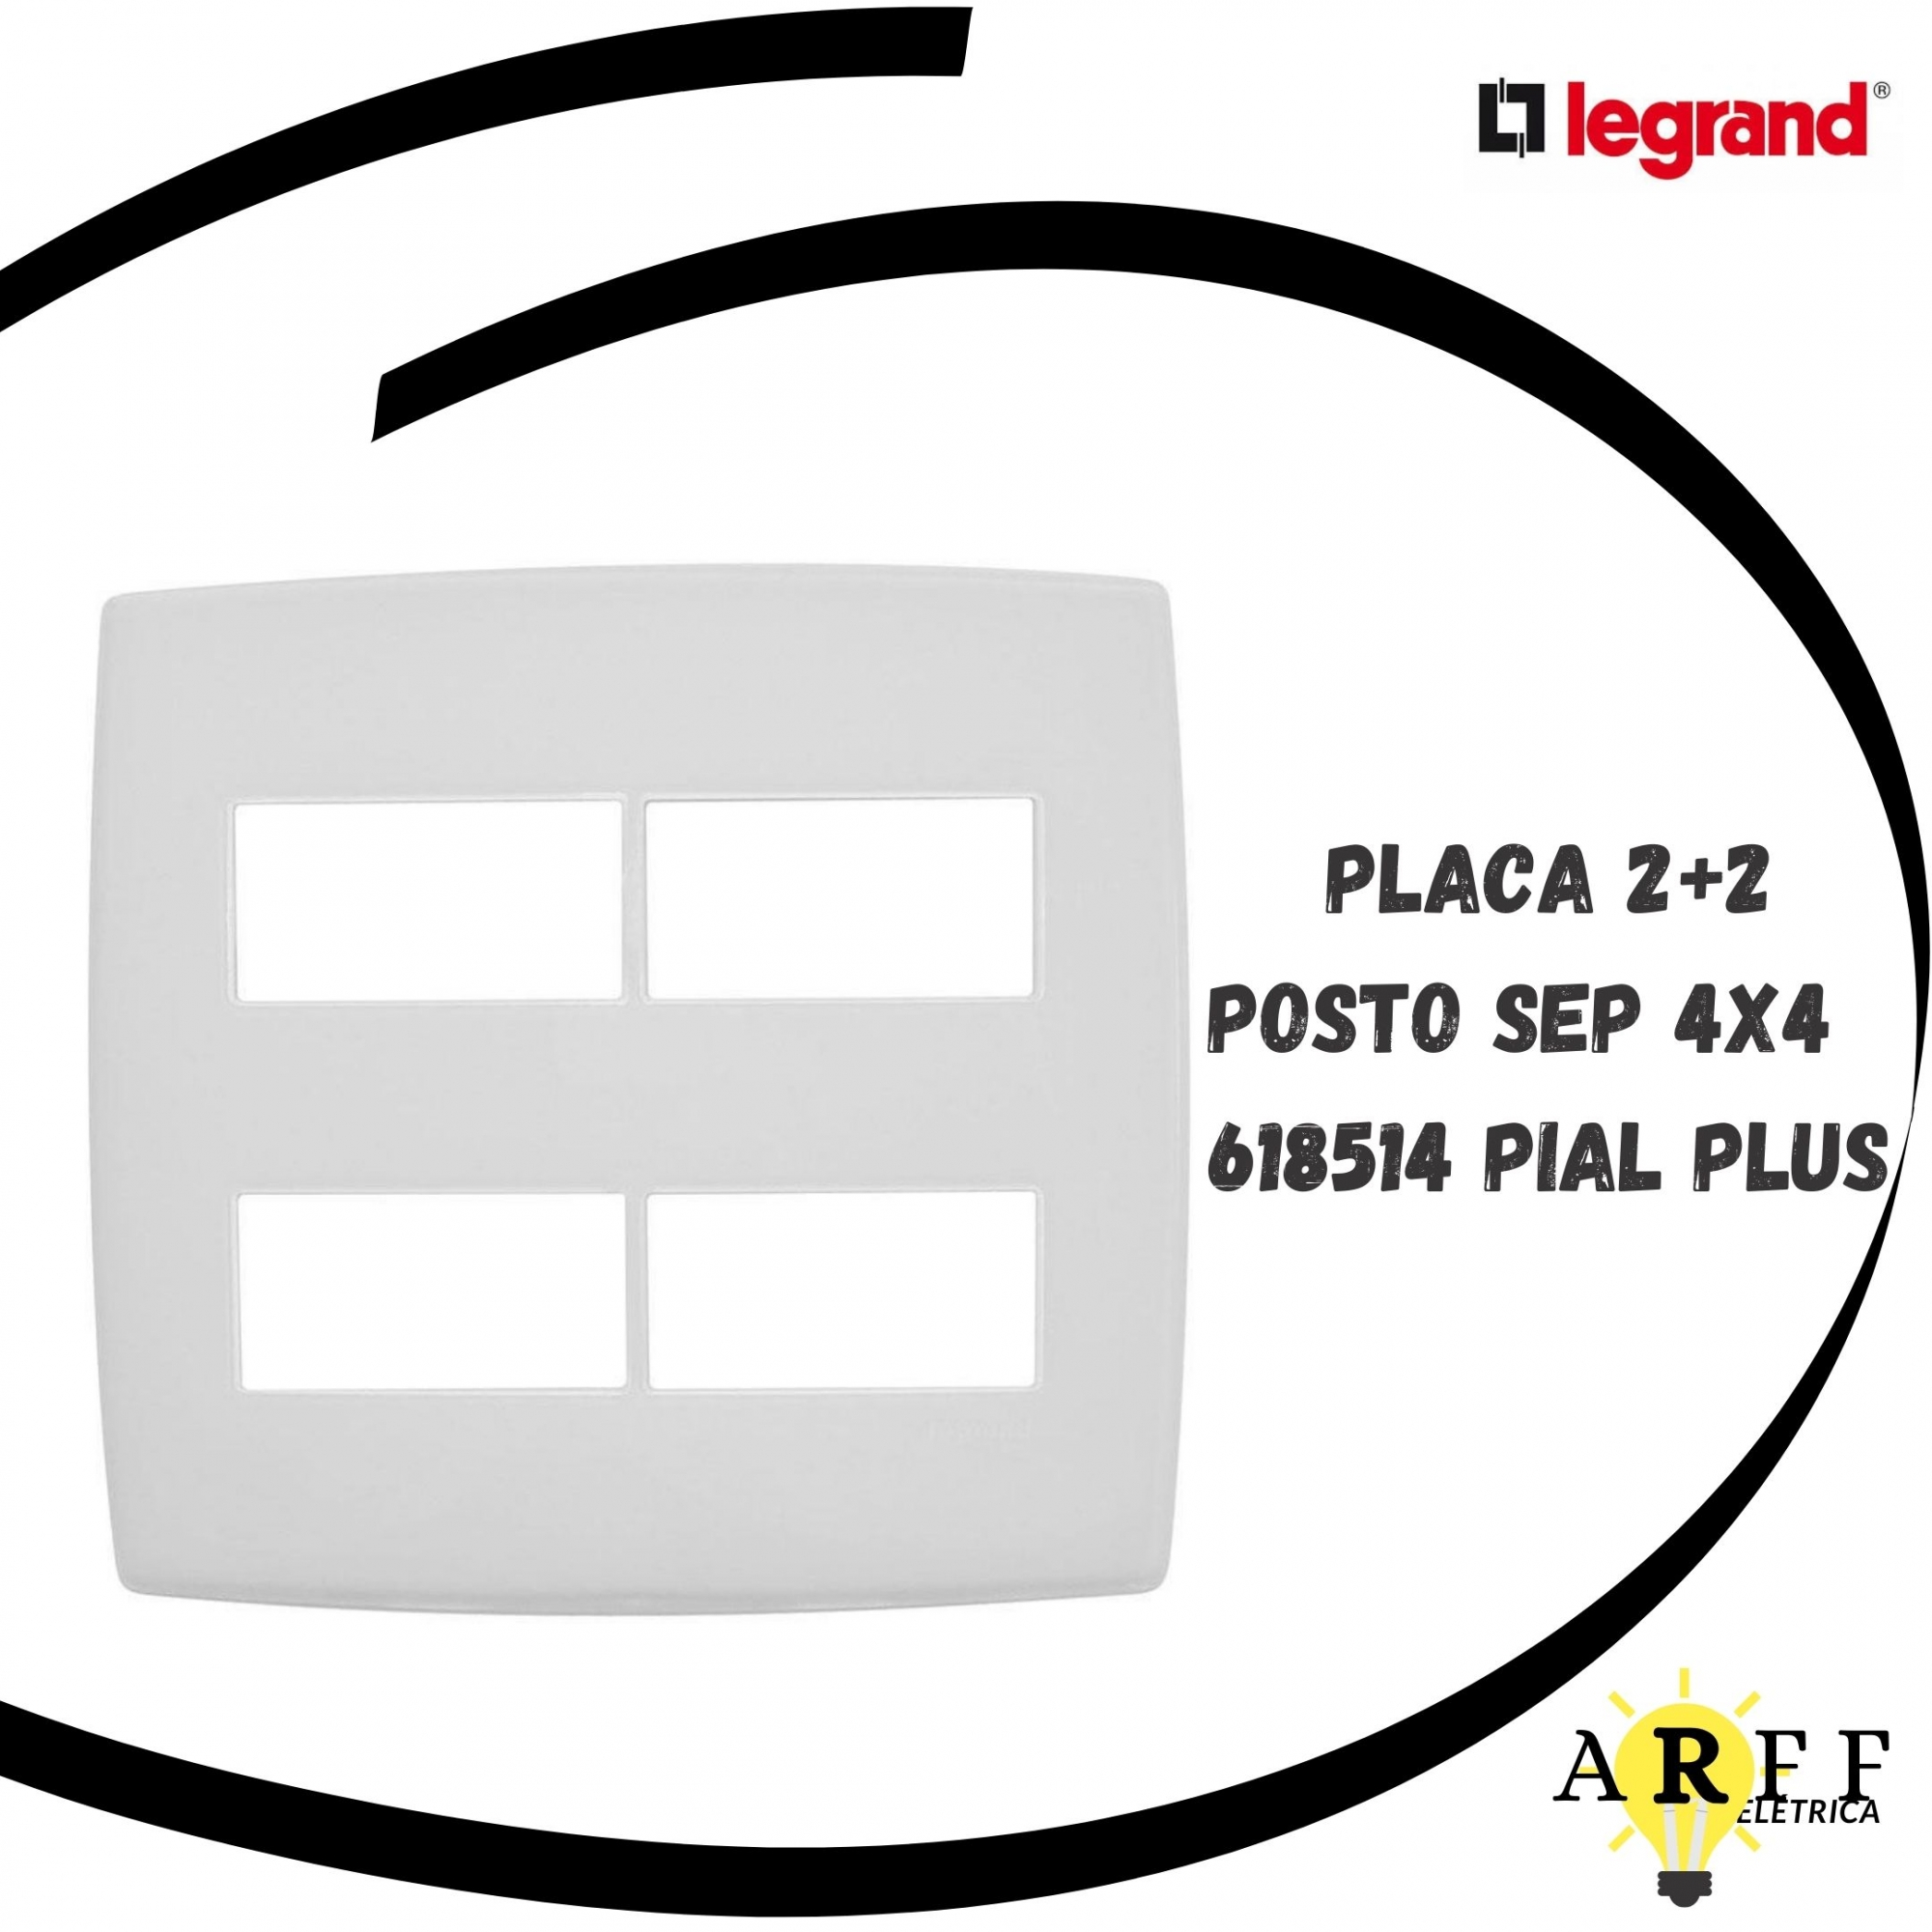 618514 Placa 2+2 Posto Sep 4x4 PIAL PLUS LEGRAND